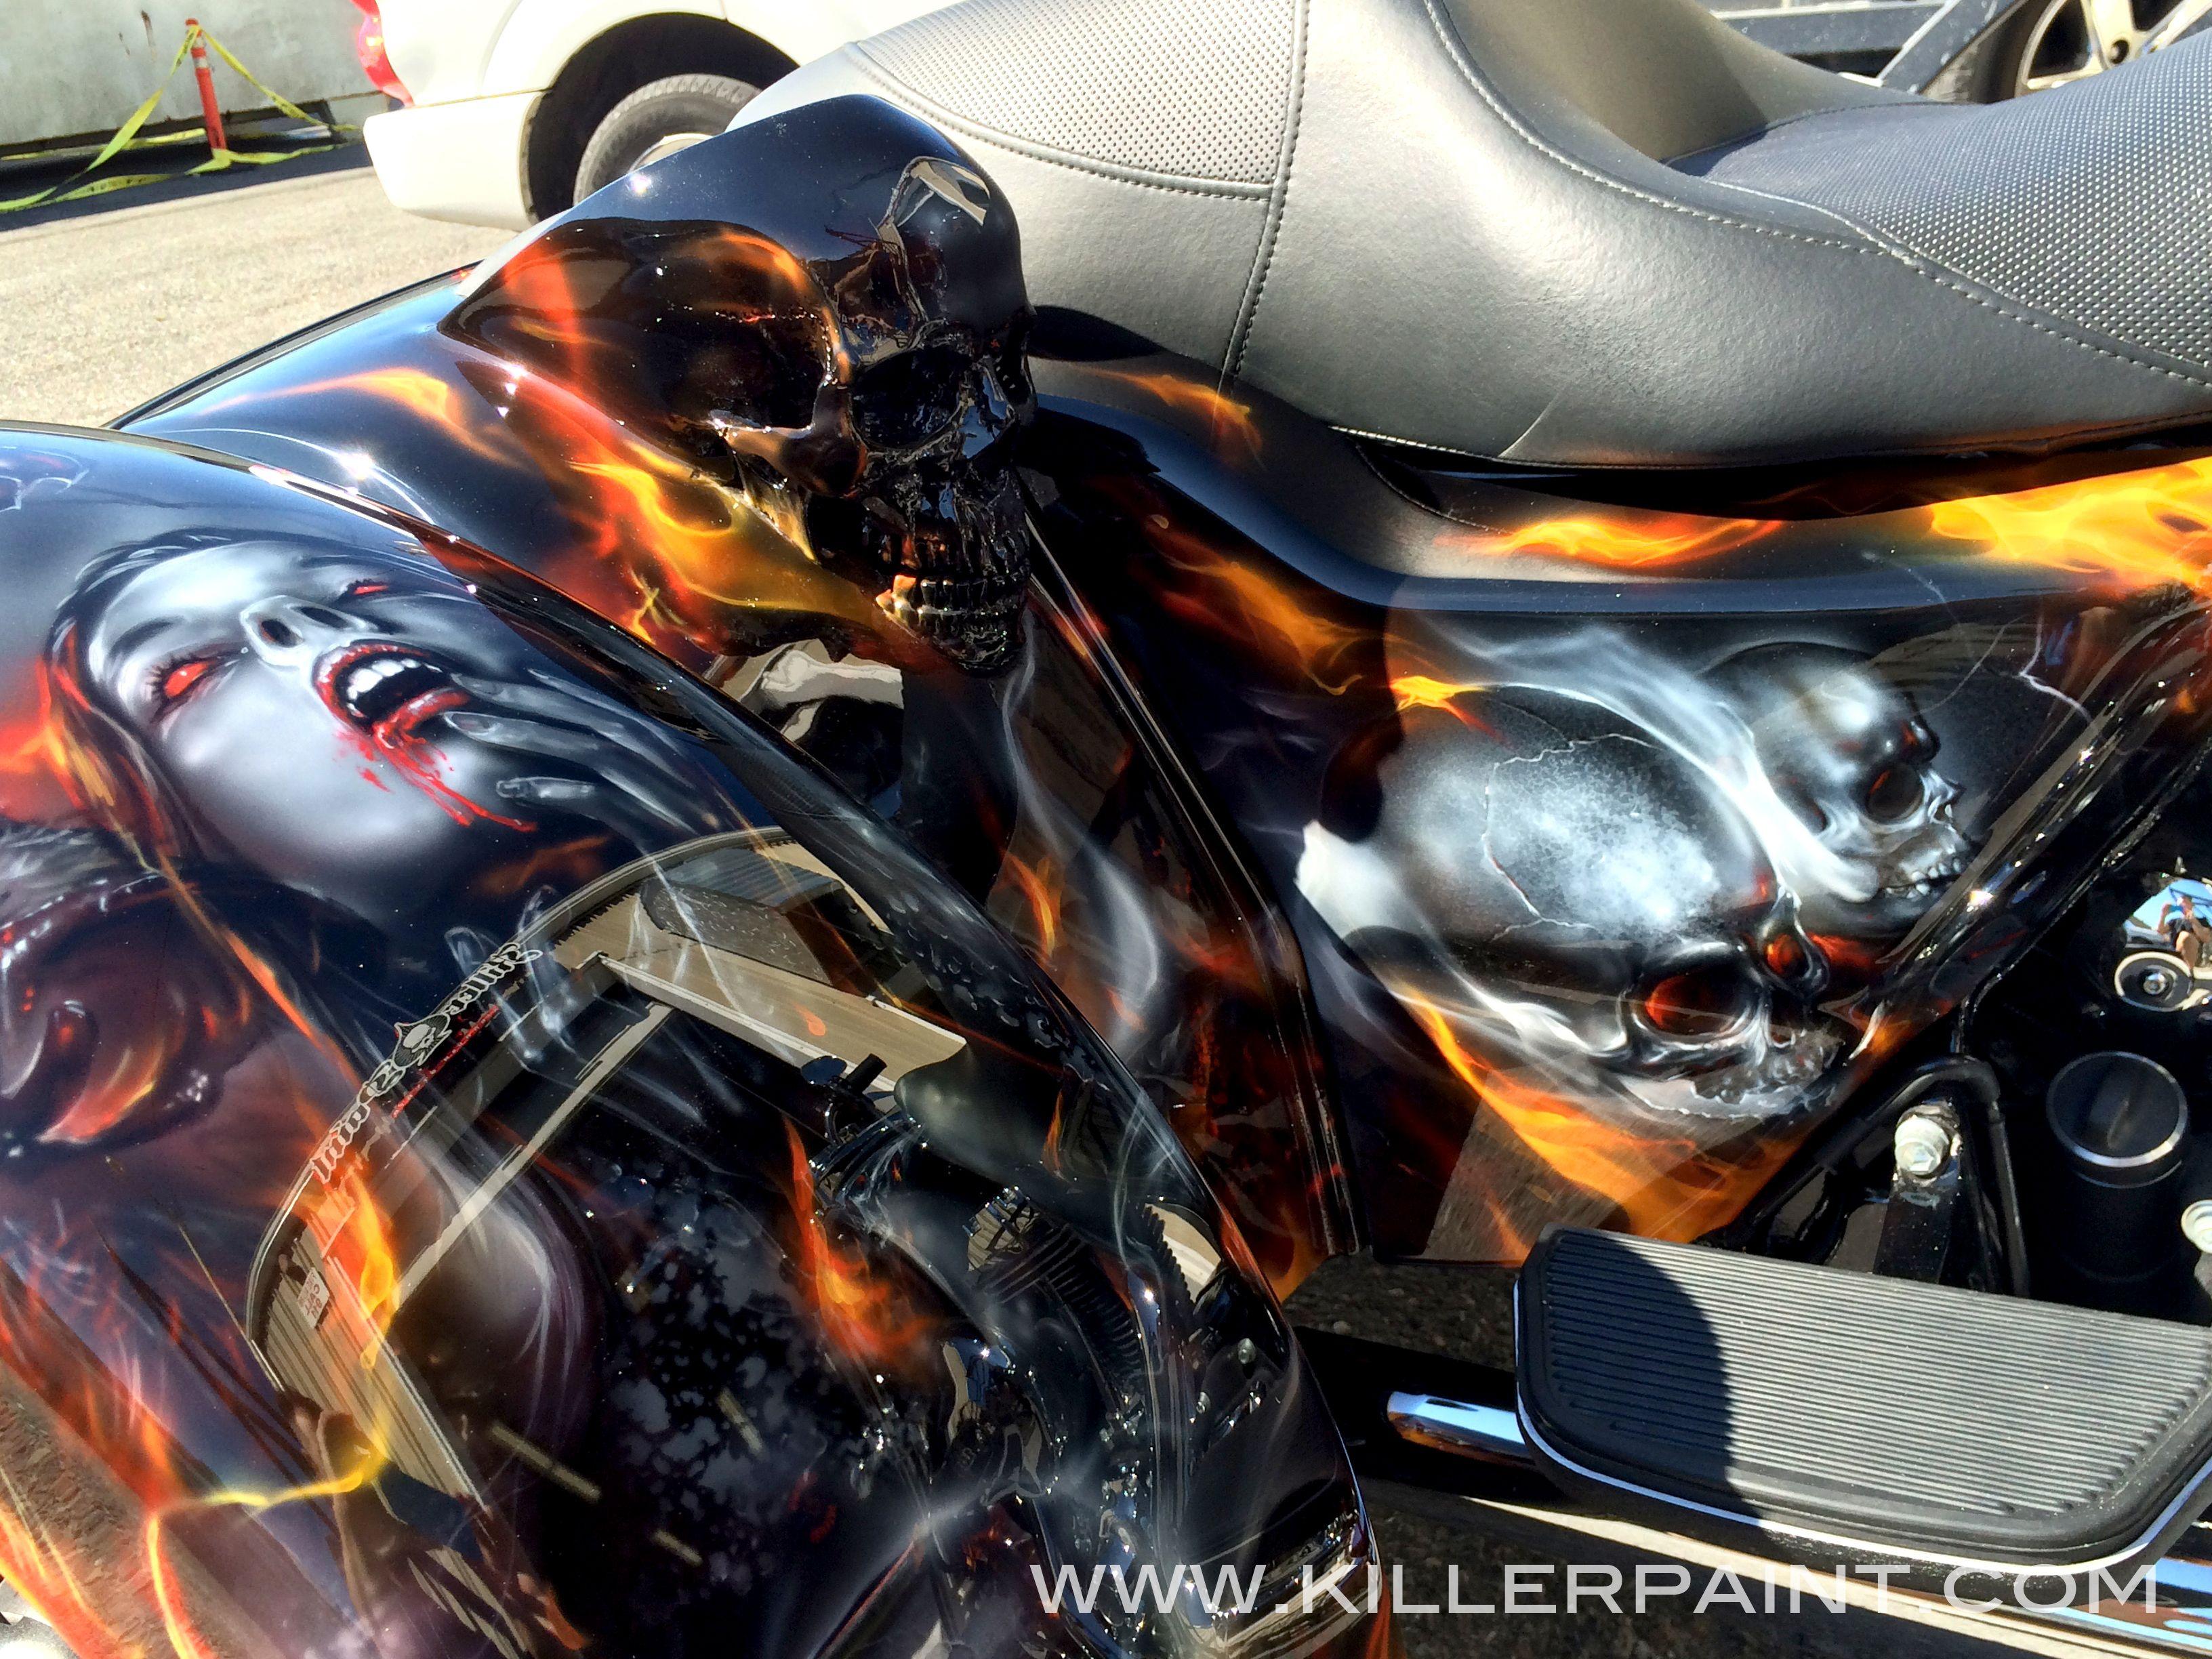 Freewheelin Vampires Bikes Airbrush Art Motorcycle